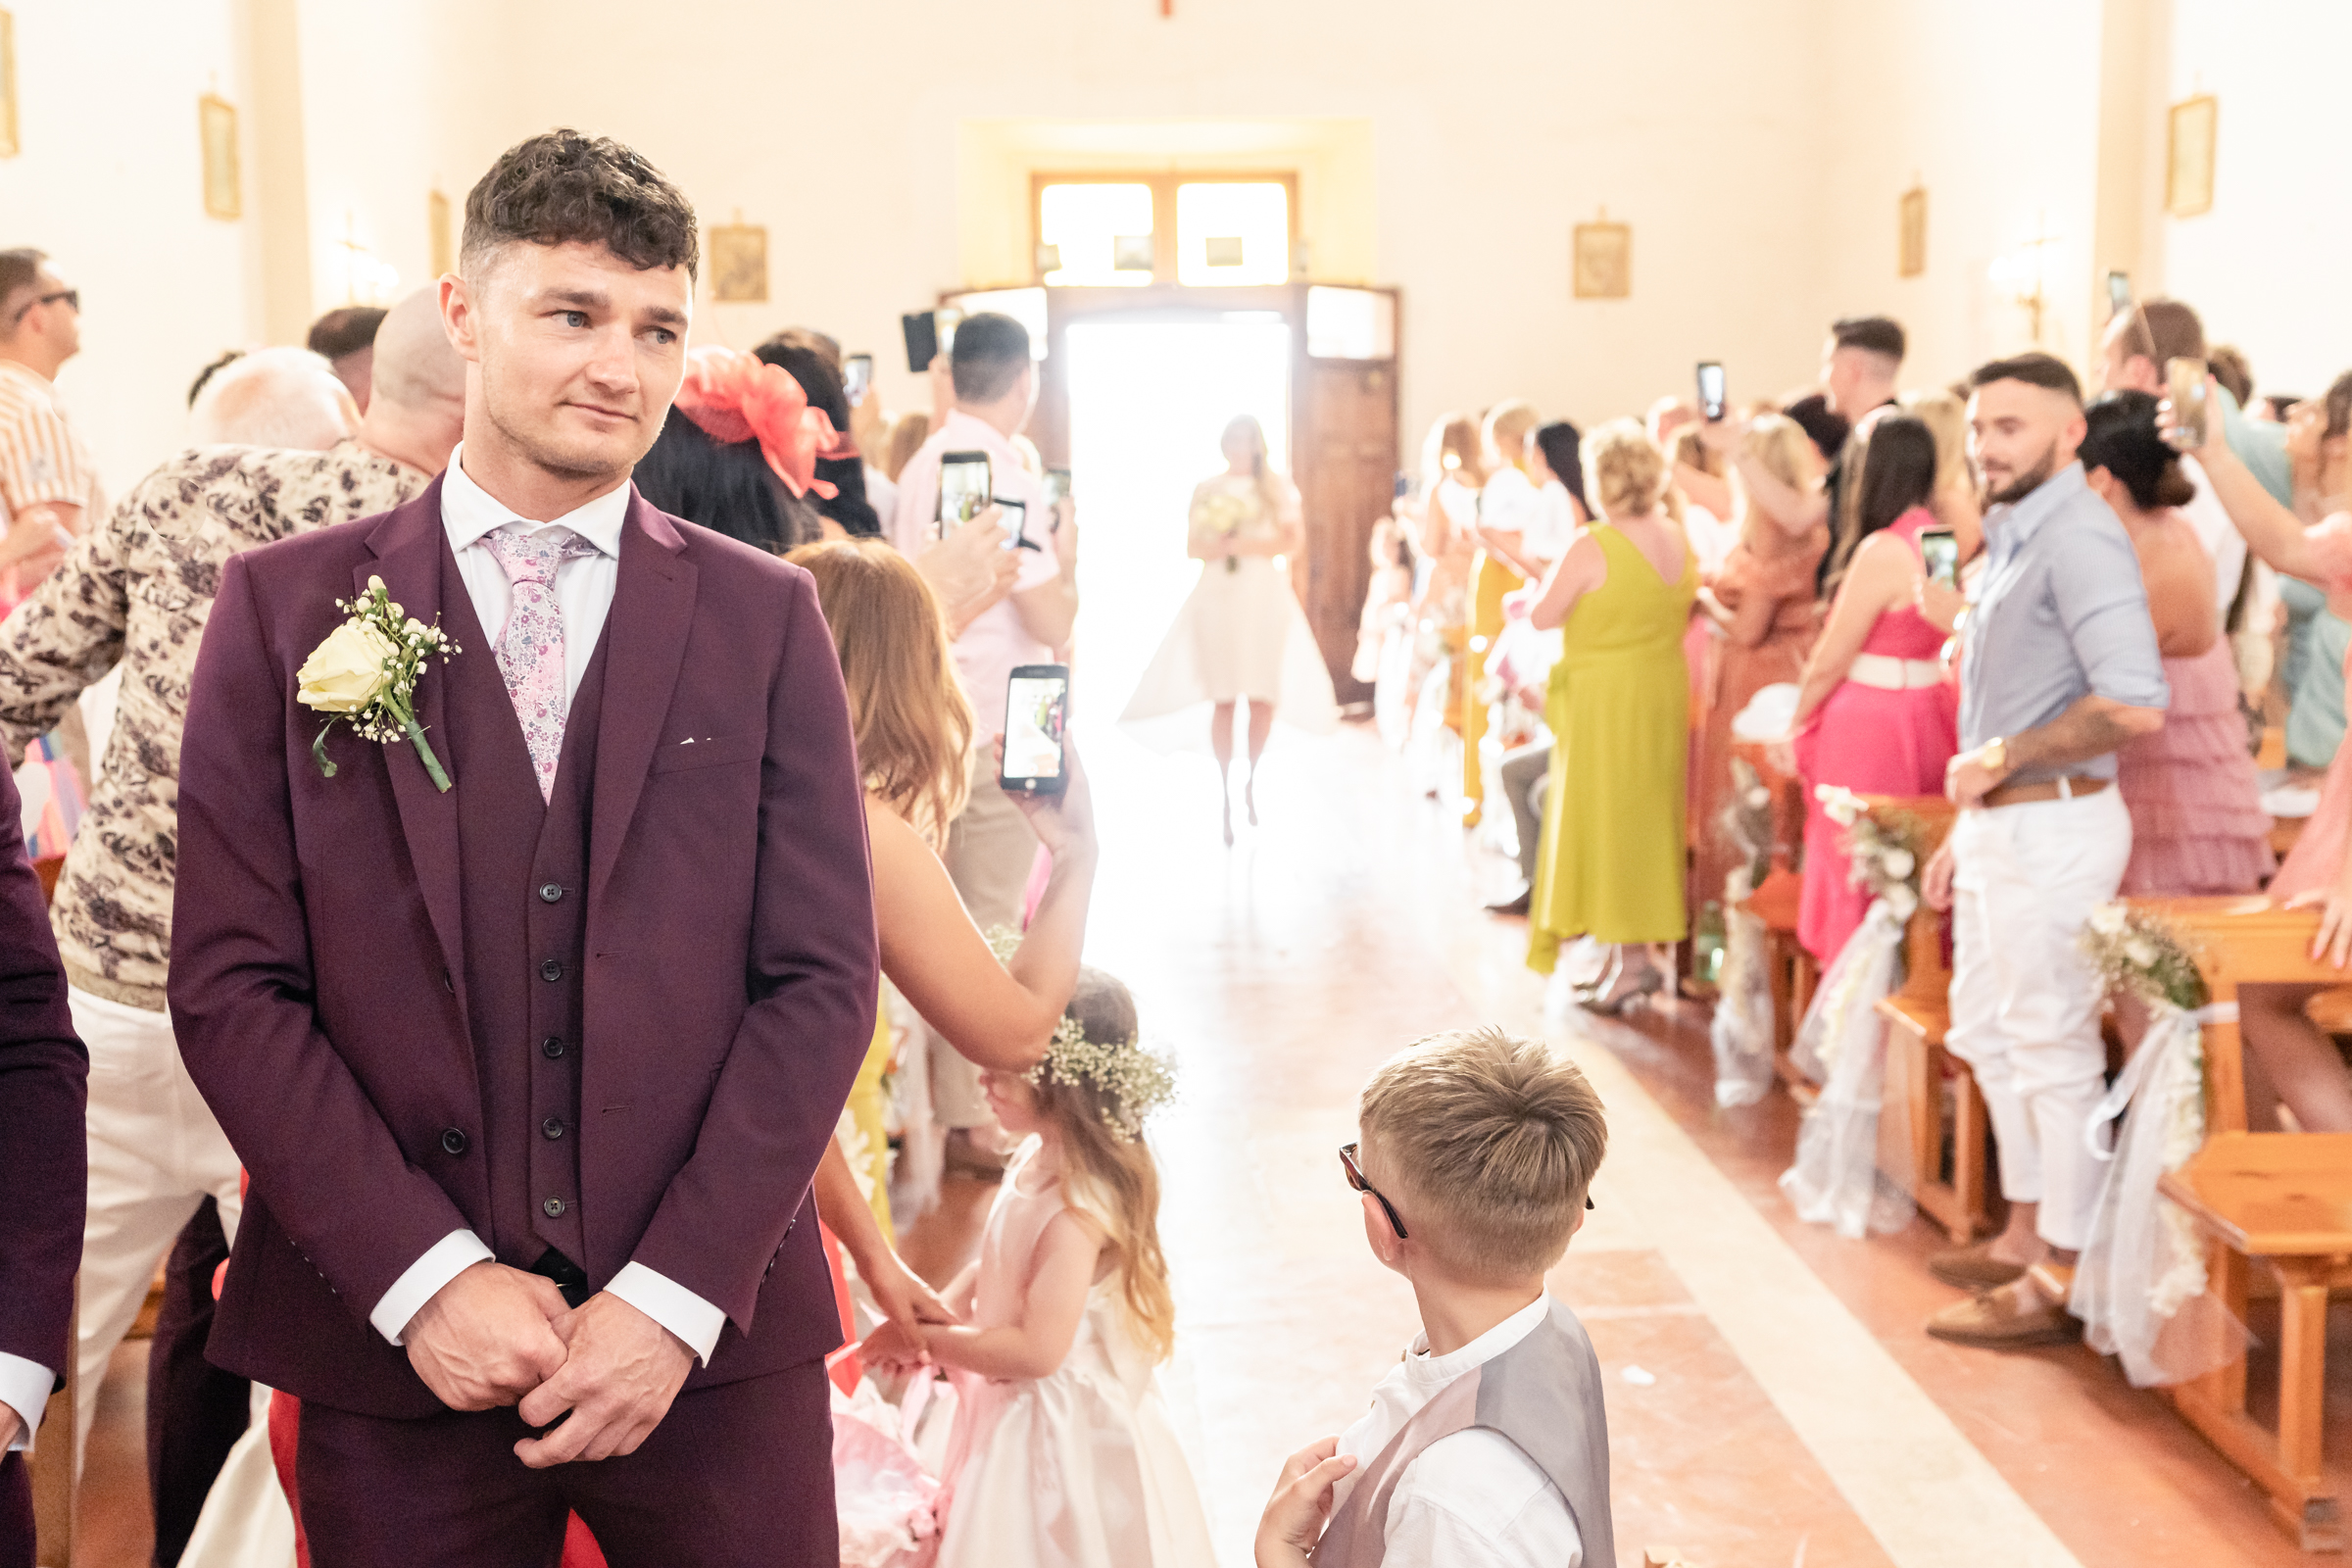 Borgo di tragliata Wedding-16.jpg